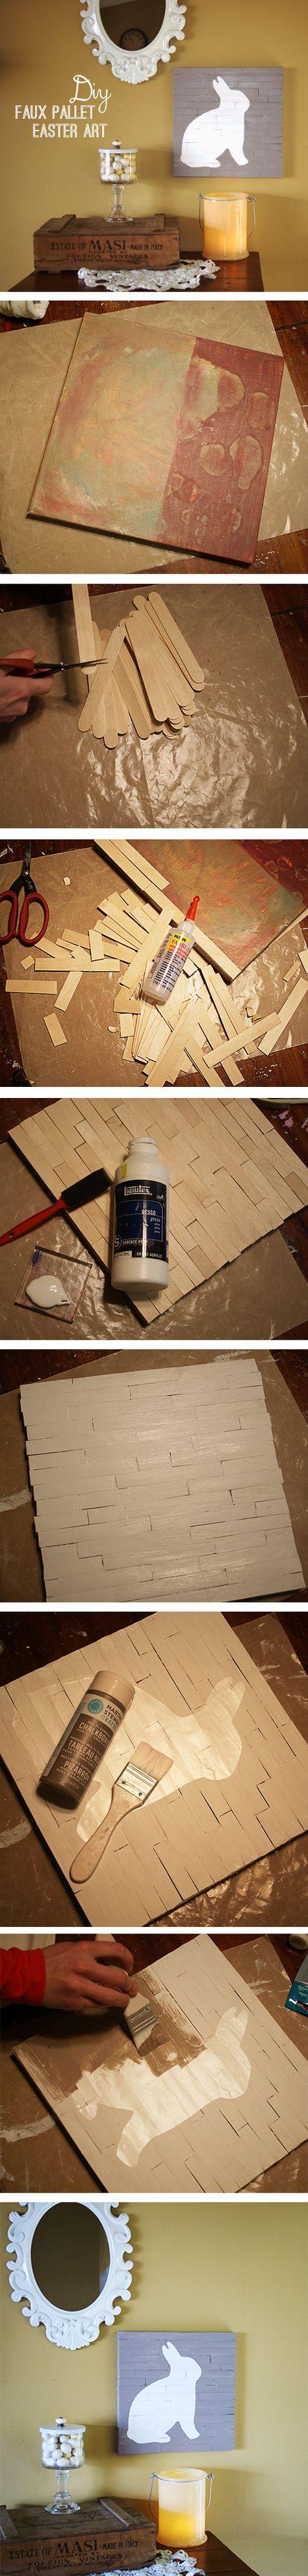 Make Faux Wood Pallet Art #Easter @savedbyloves